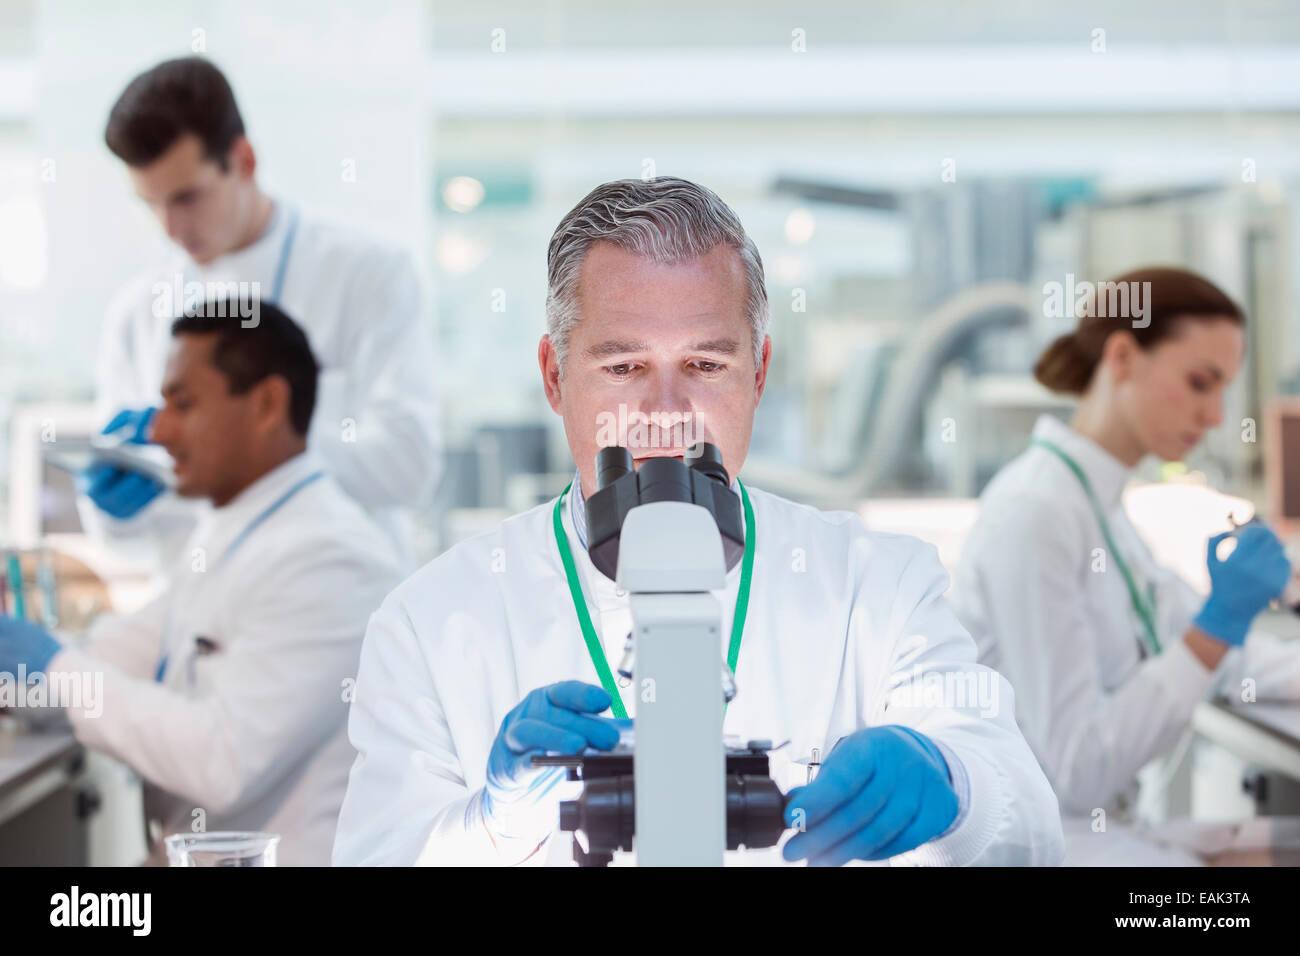 Scientist examining sample under microscope in laboratory - Stock Image